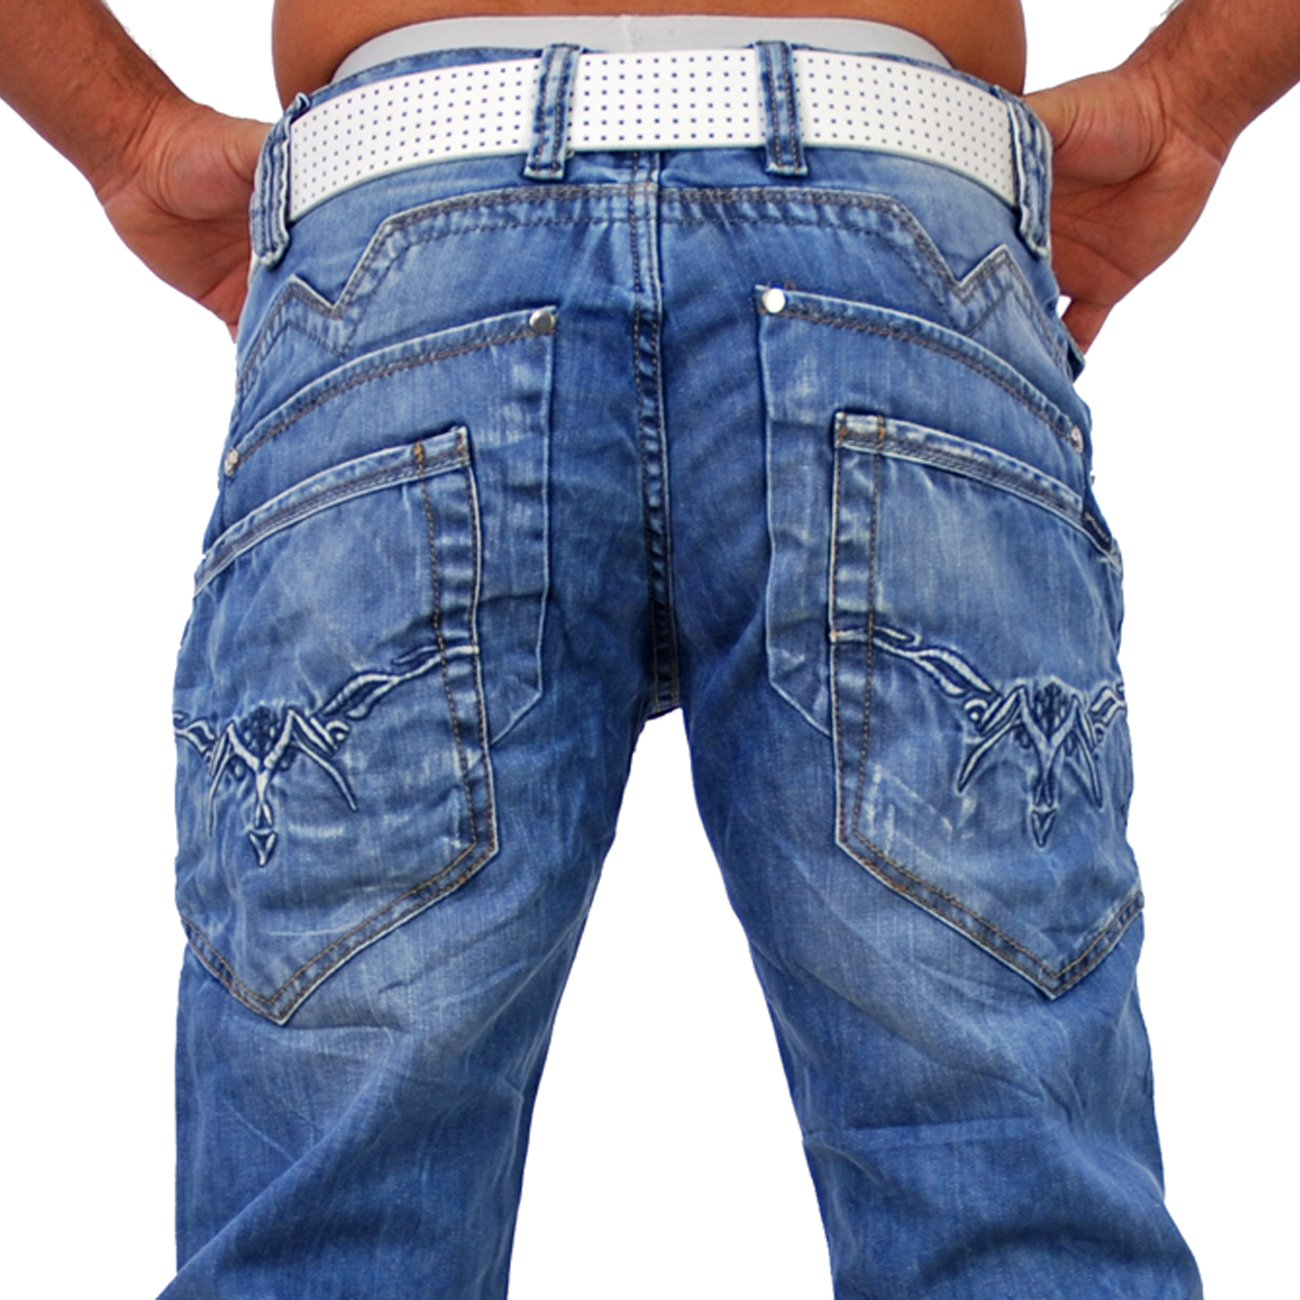 cipo baxx used look jeans hose c 842 blau g nstig. Black Bedroom Furniture Sets. Home Design Ideas